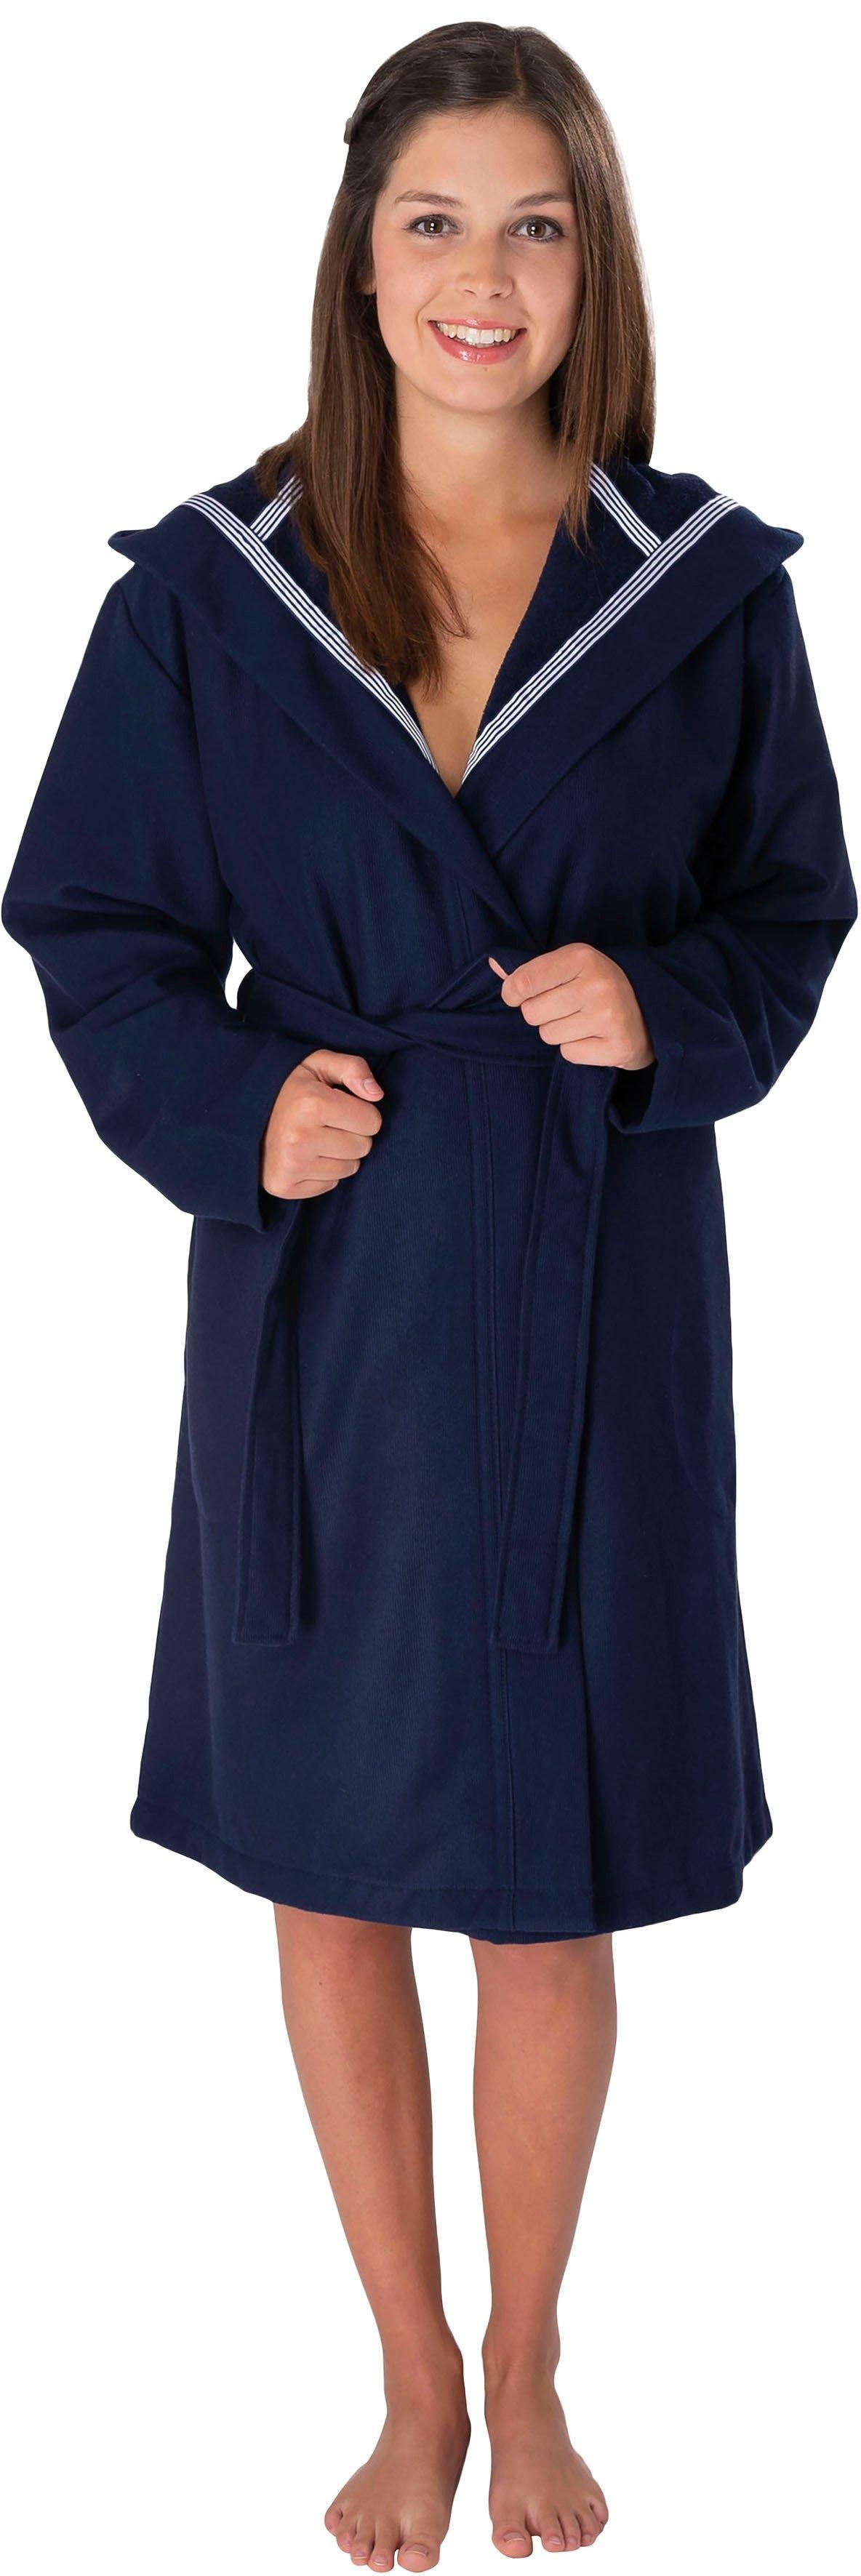 Wewo fashion uniseks badjas 3900 met softtouch (1 stuk, Met riem) nu online bestellen